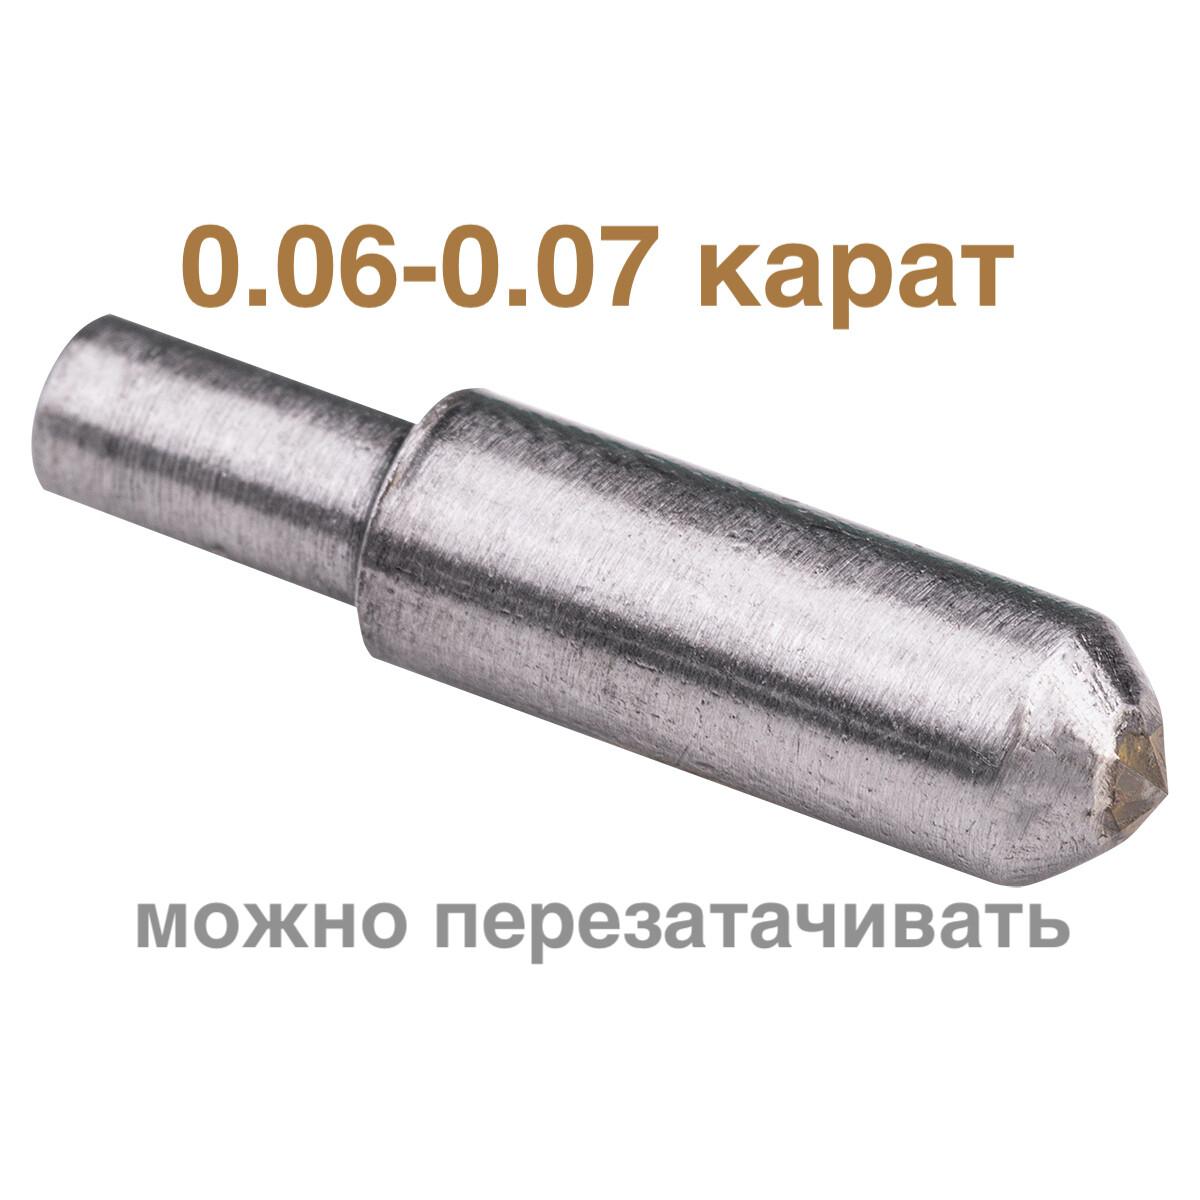 0,06-0,07карат <115°8гр. алмазная игла для станка (№1)